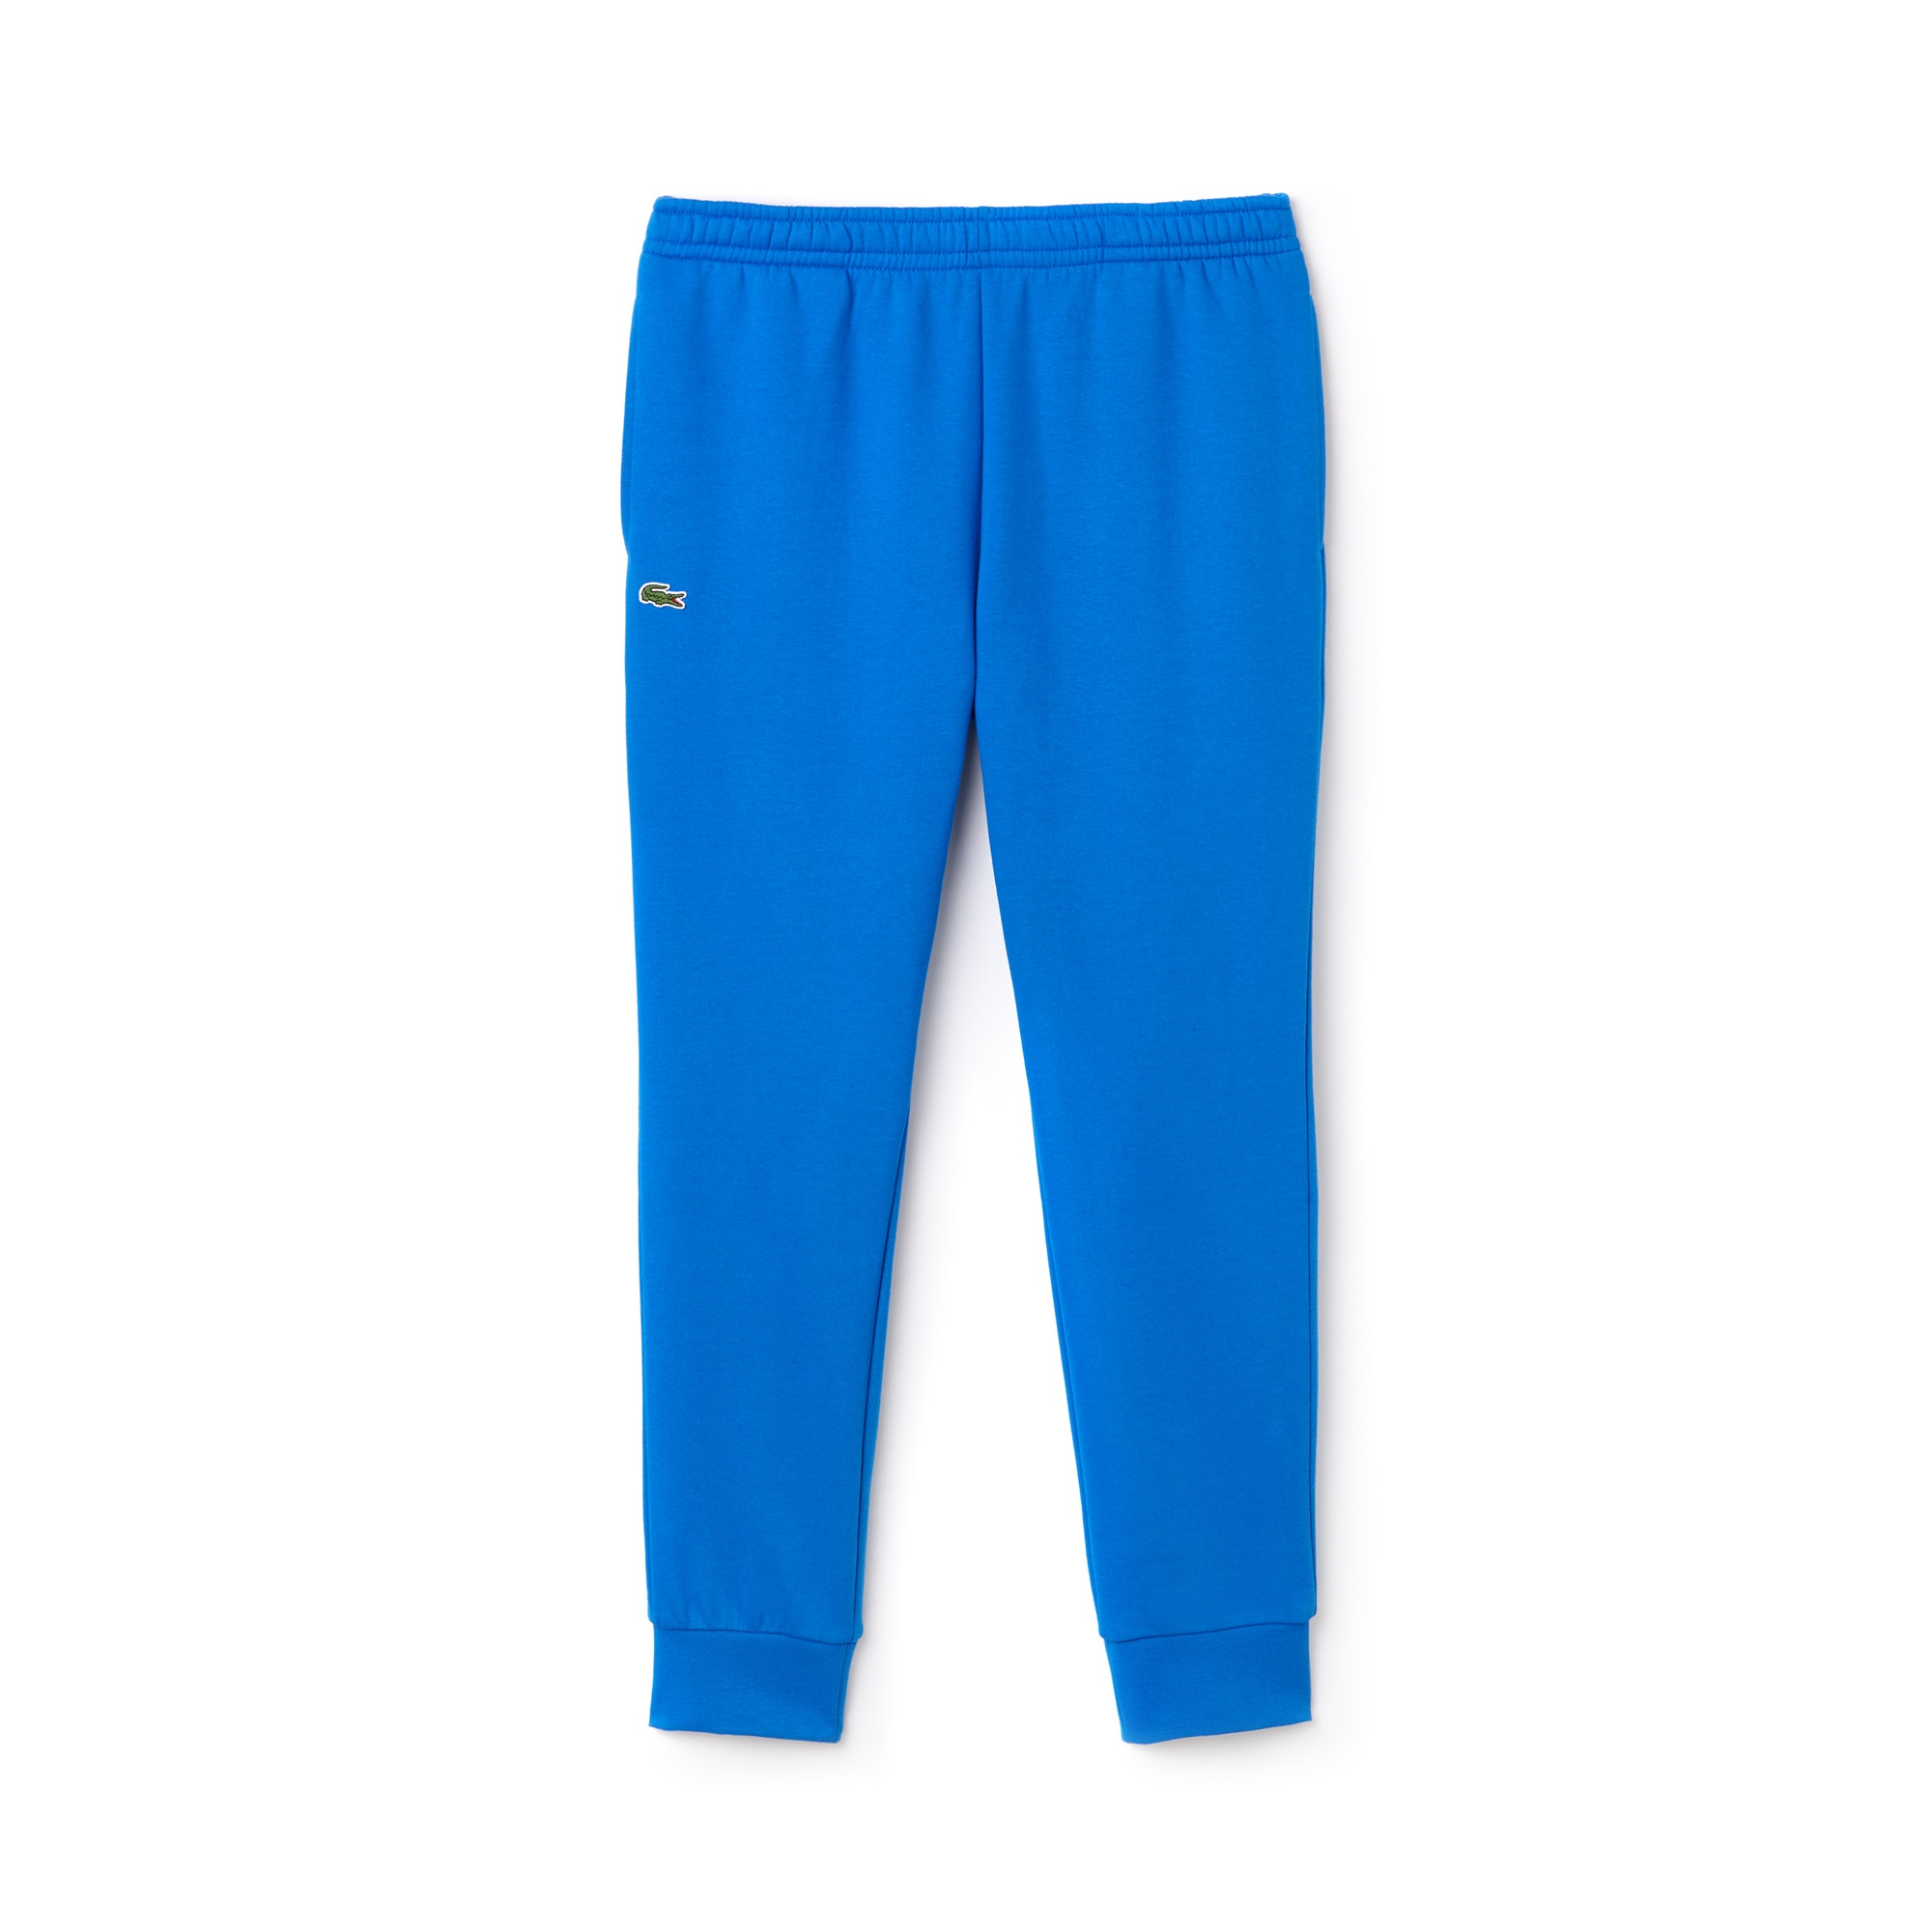 Pantalón De Deporte De Hombre Lacoste SPORT Tennis En Felpa De Algodón